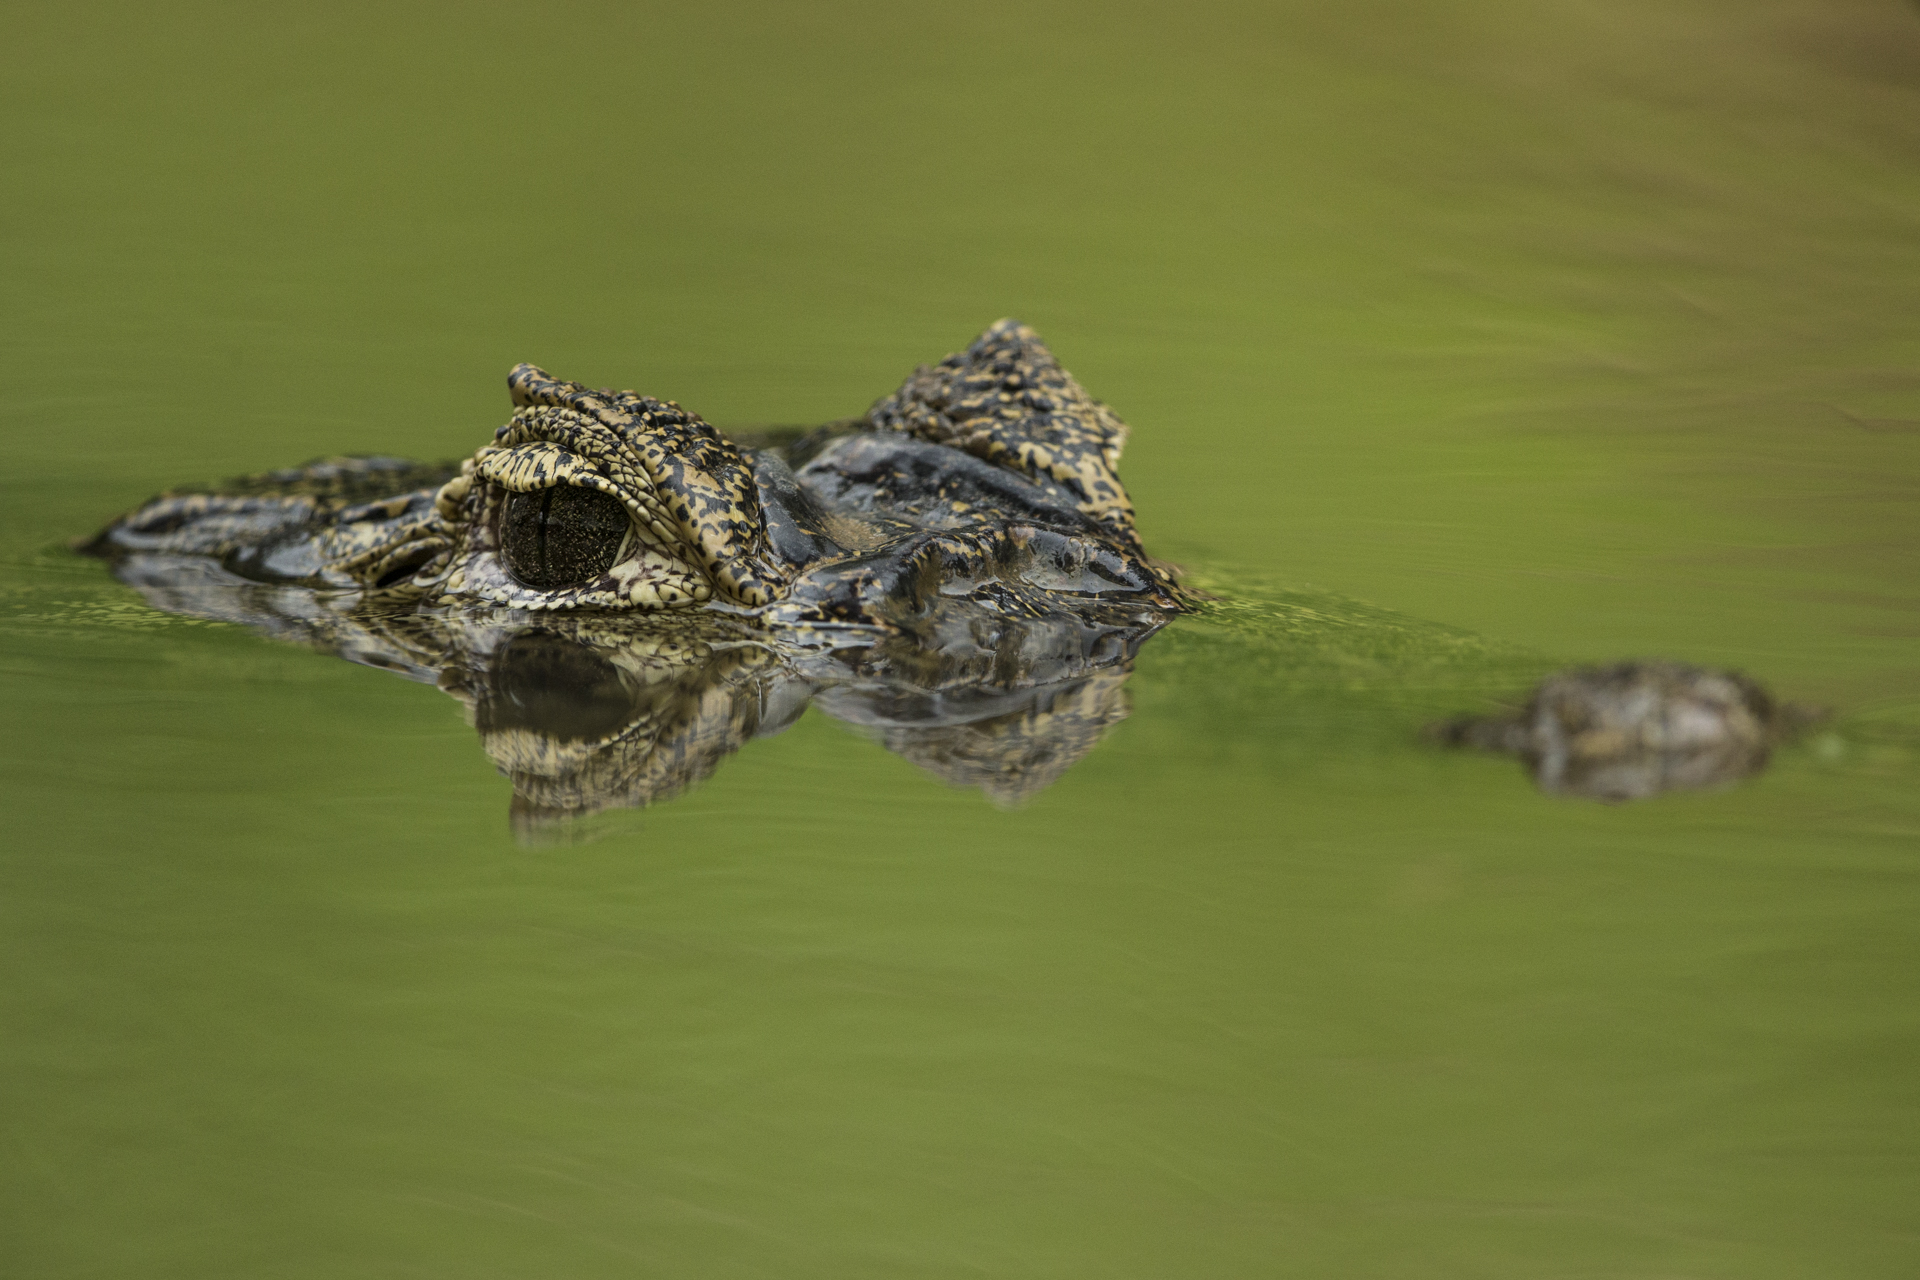 A Yacare Caiman in the Pantanal.